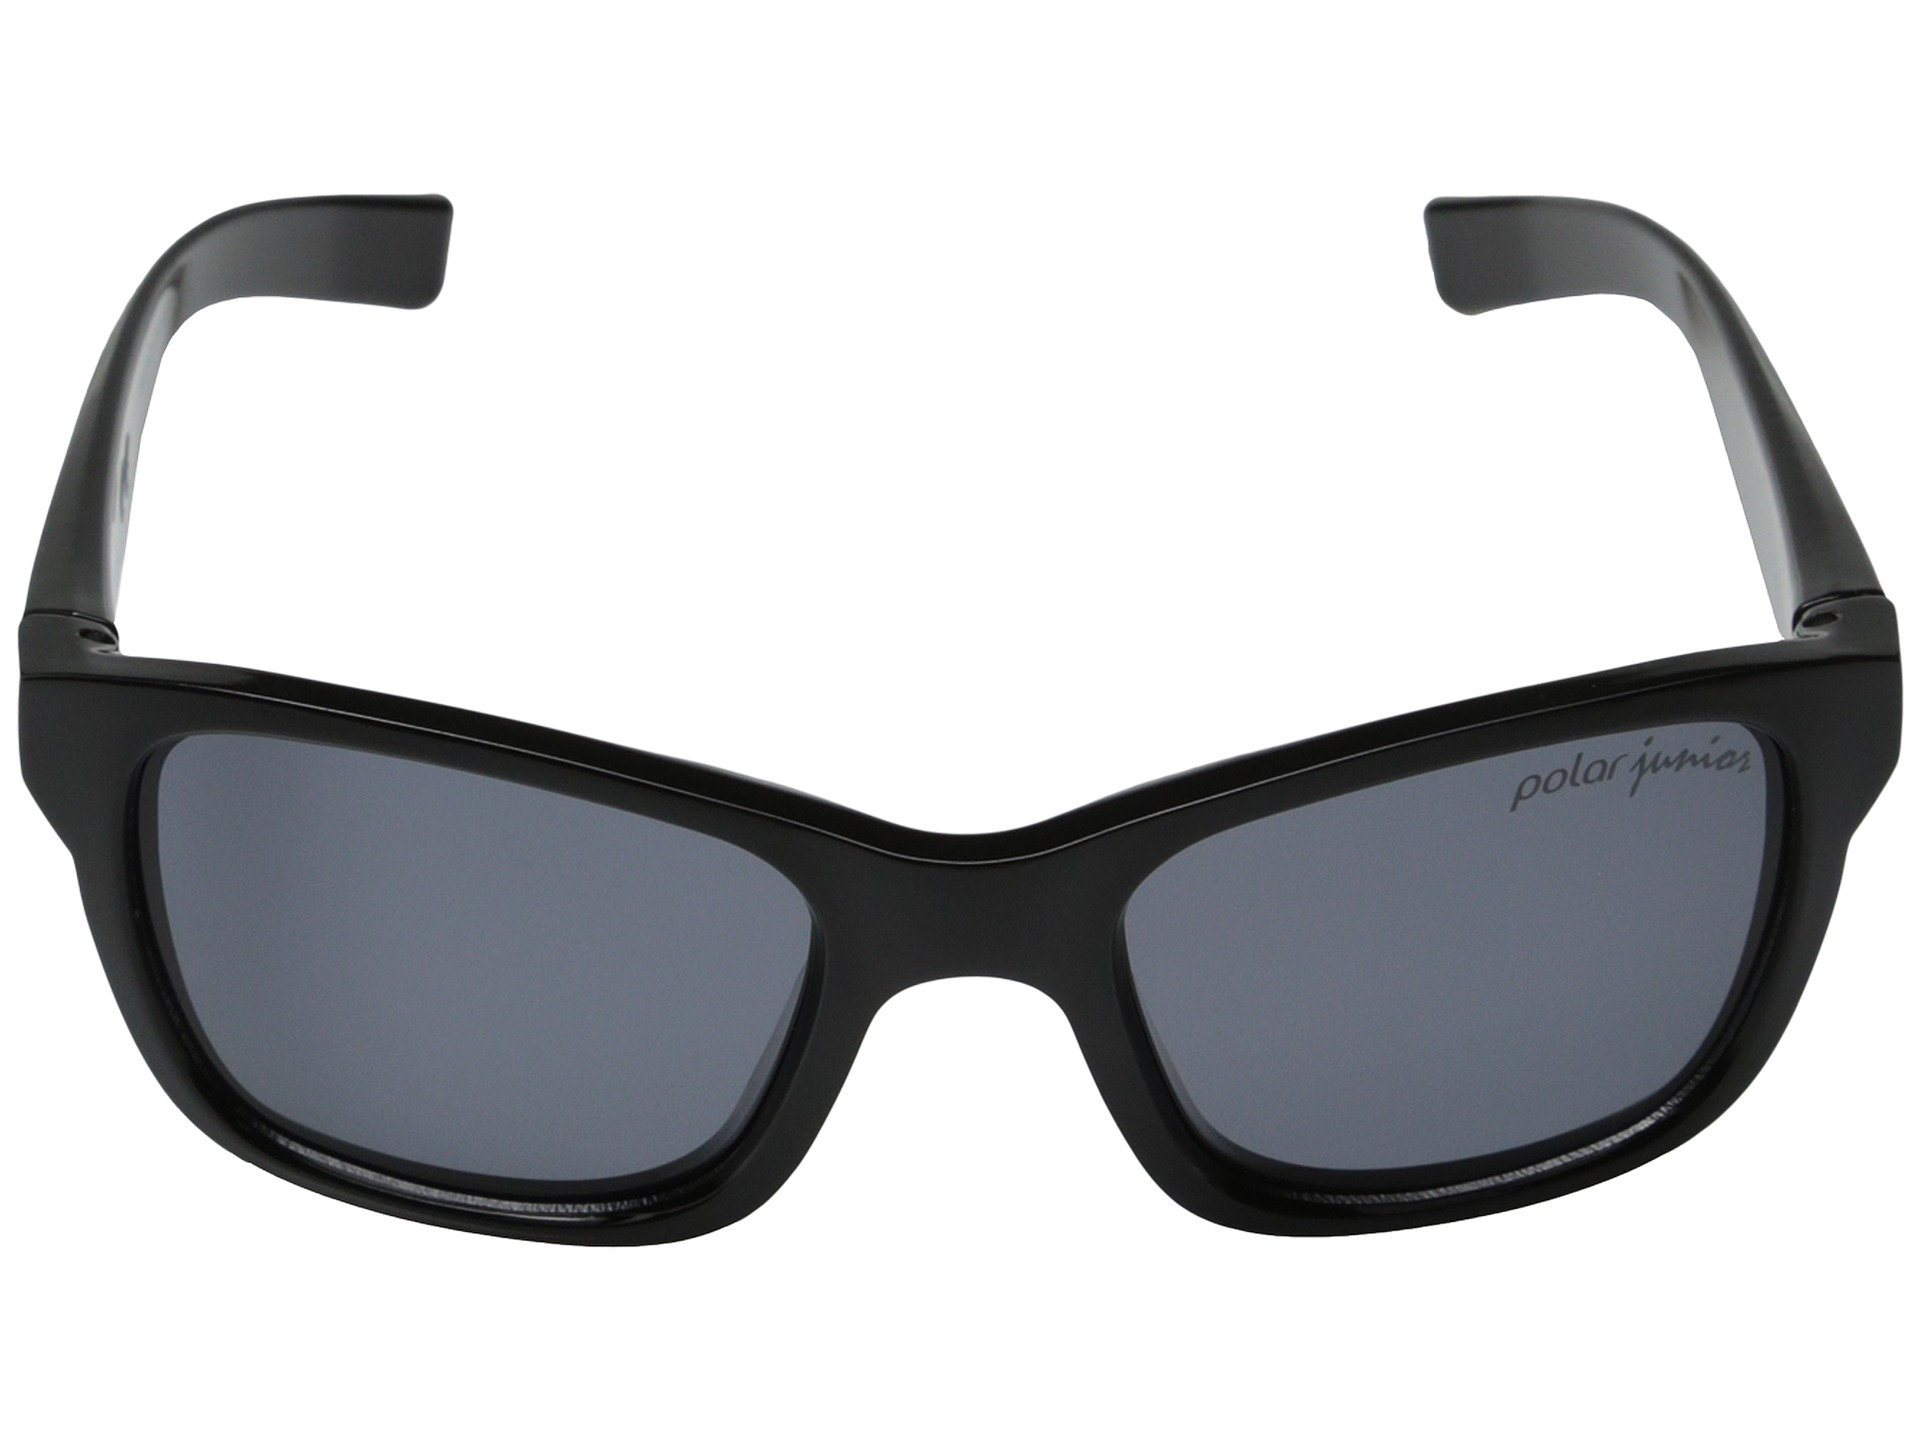 2a0565c802535 On Julbo Lenses Kids Sunglasses Black Eyewear Reach Polarized With 64qr68x